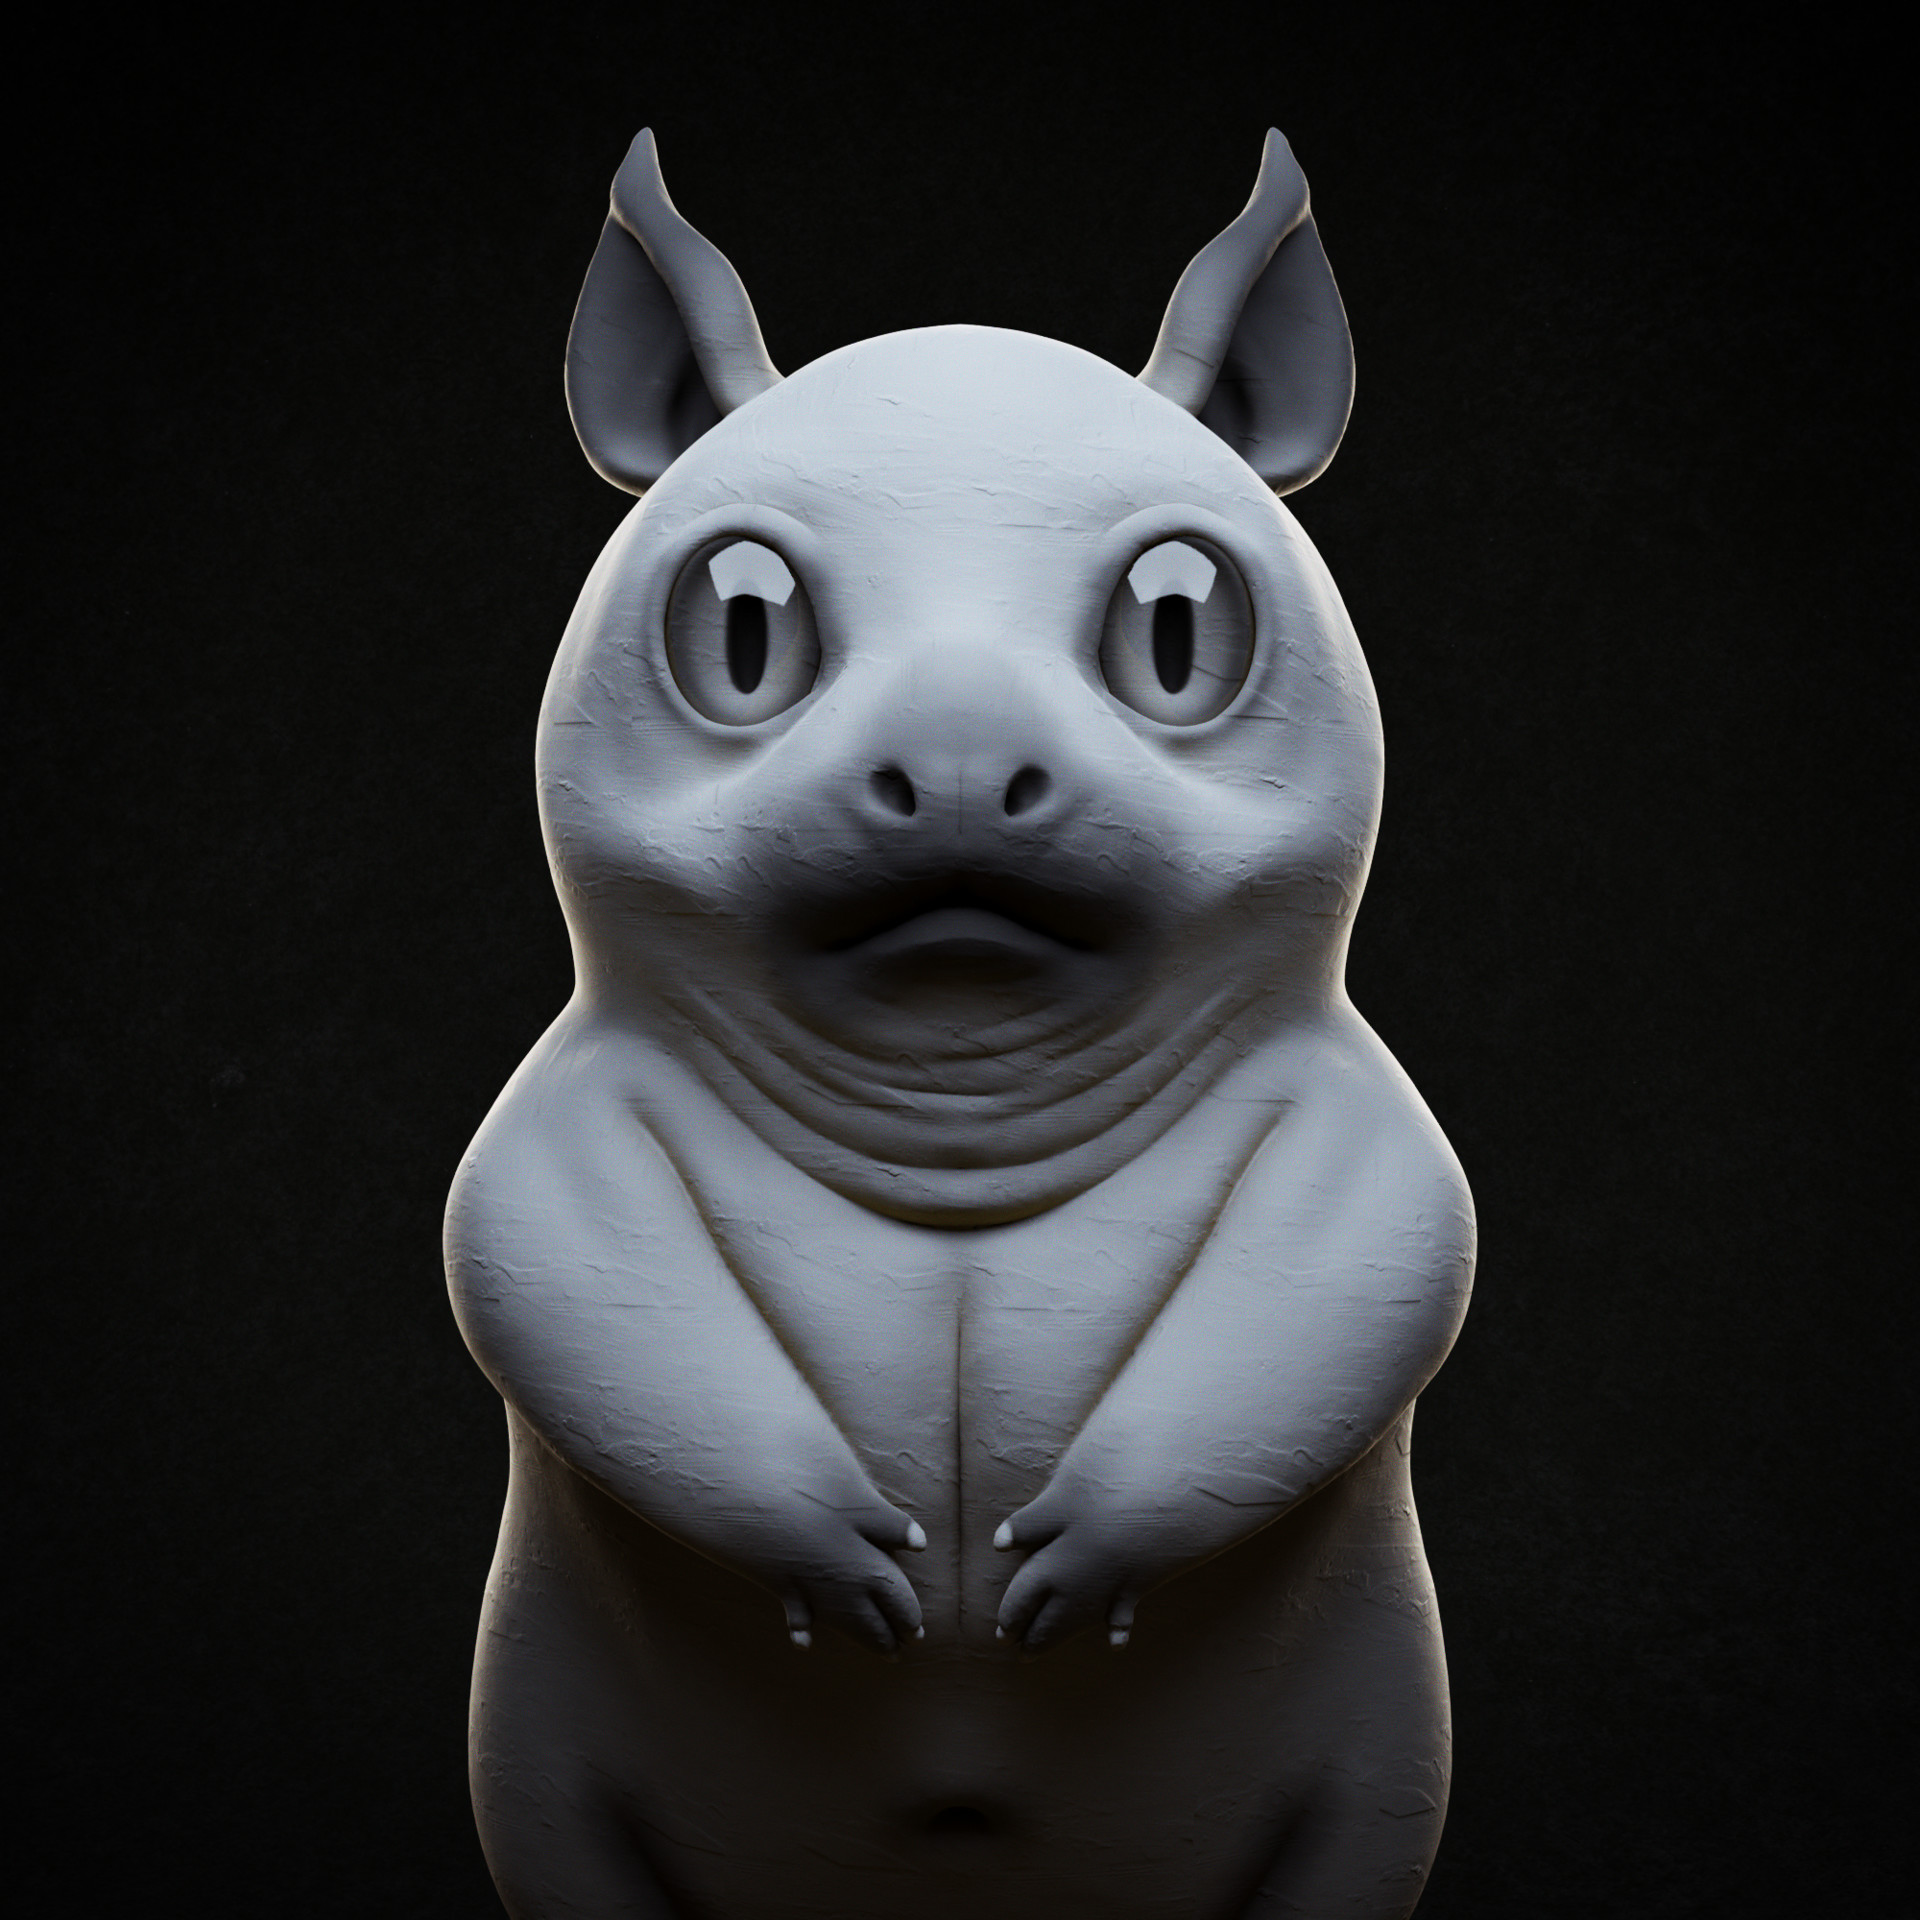 Day 08: Eyes (based on an artwork by Roberto Padula: https://www.artstation.com/artwork/04Pk8)